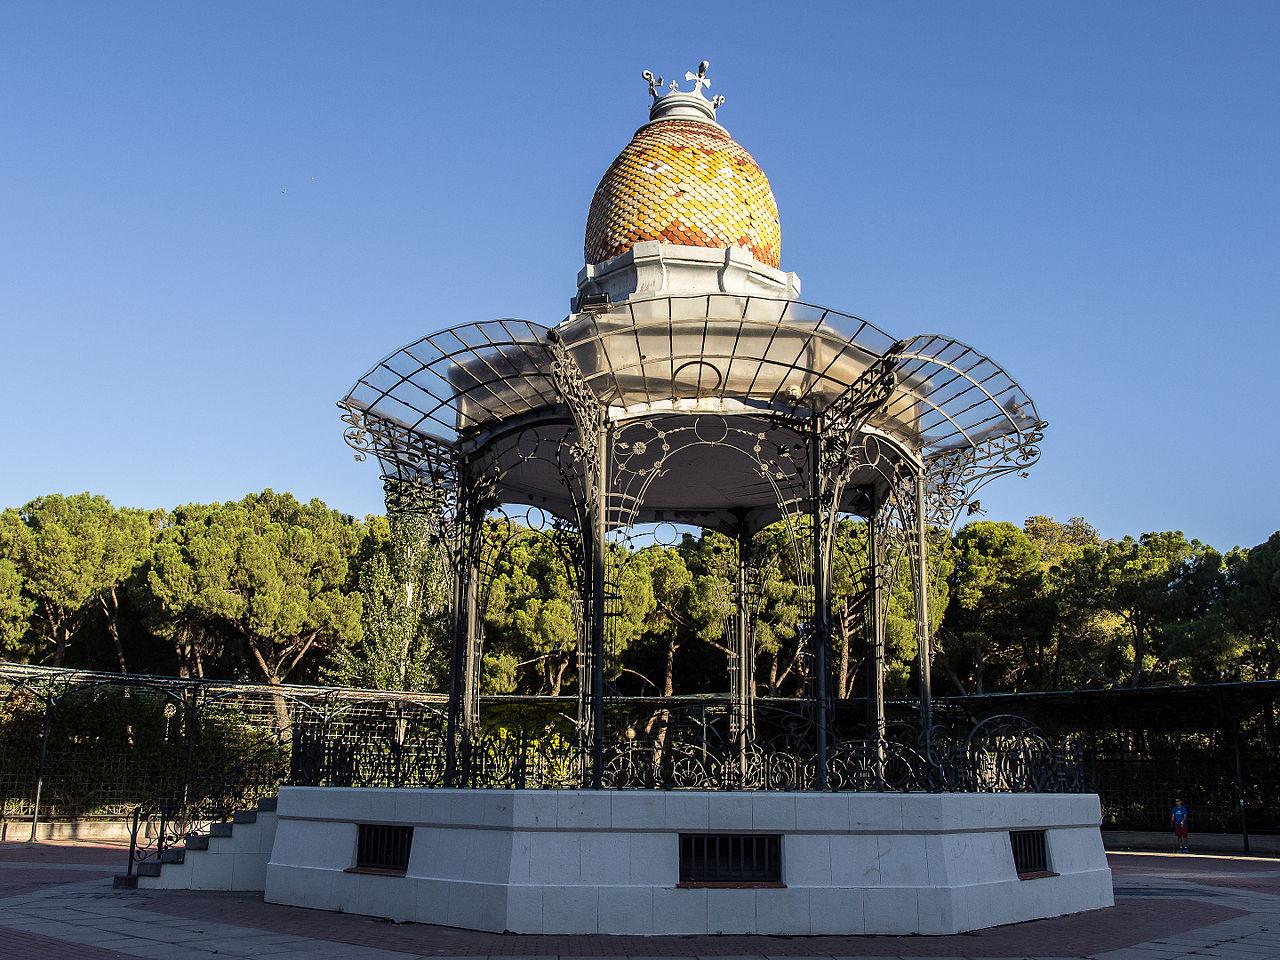 Parque Grande-Zaragoza - P8095639.jpg